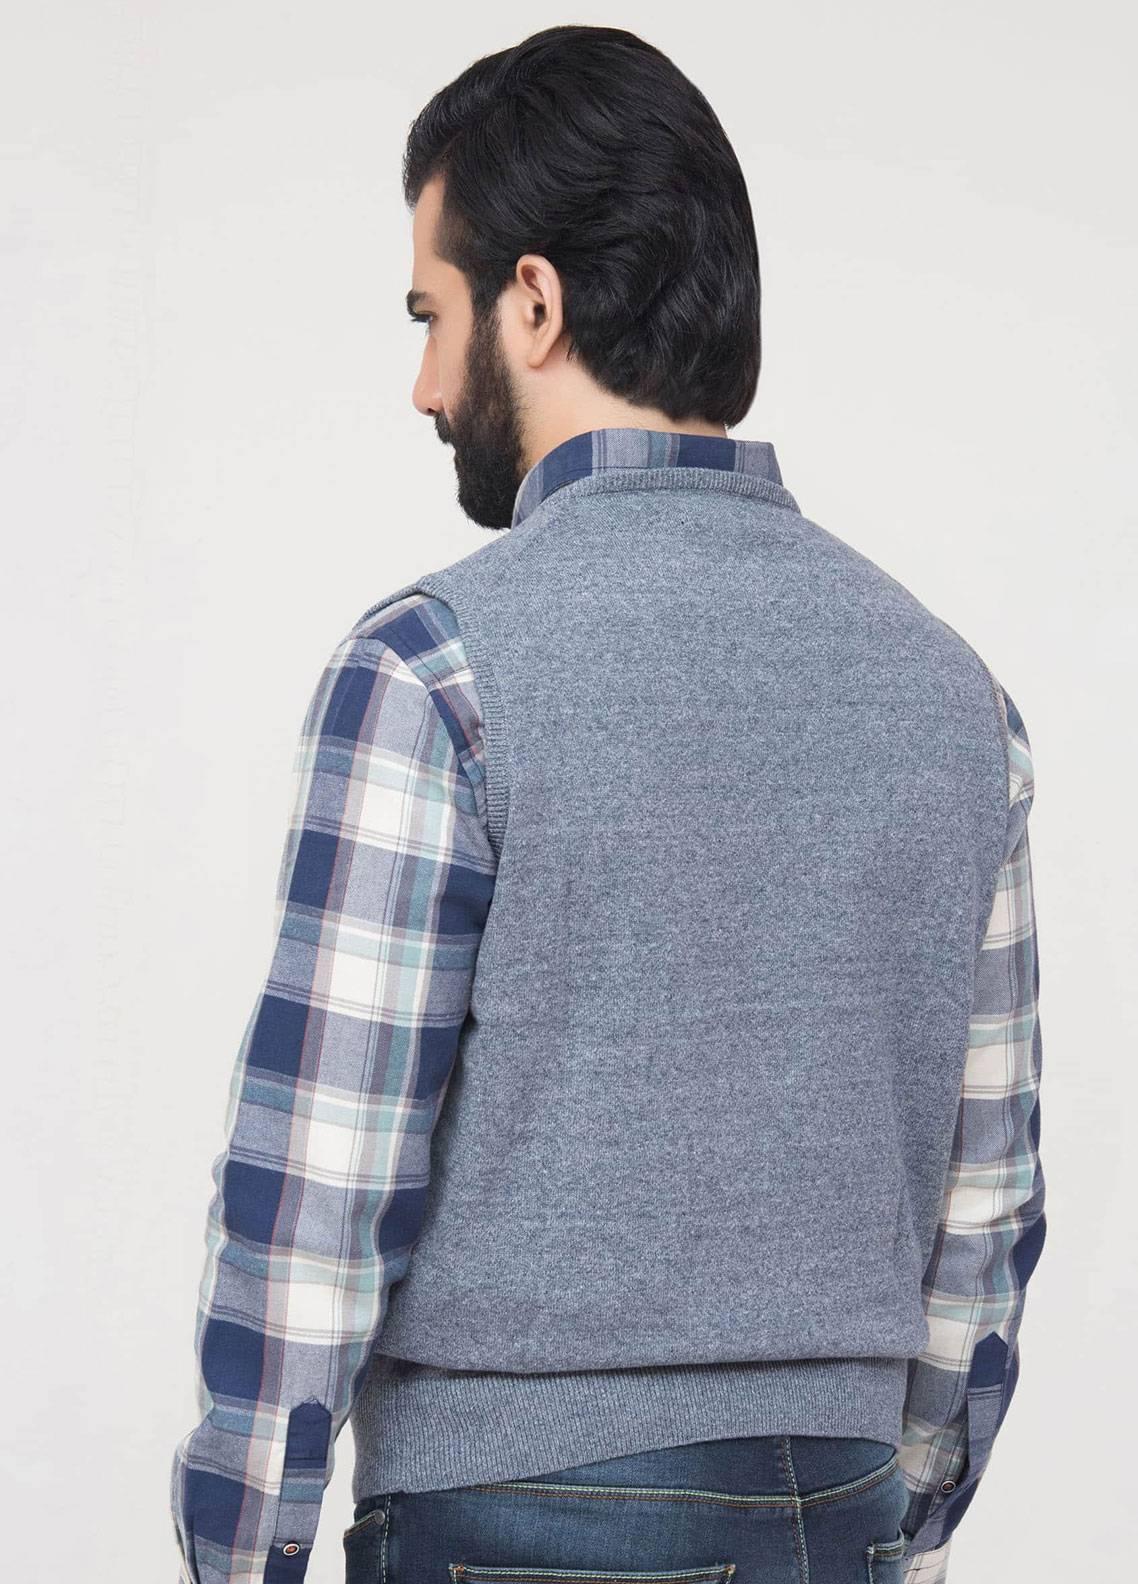 Brumano Cotton Sleeveless Men V-Neck Sweaters - Blue SL-301